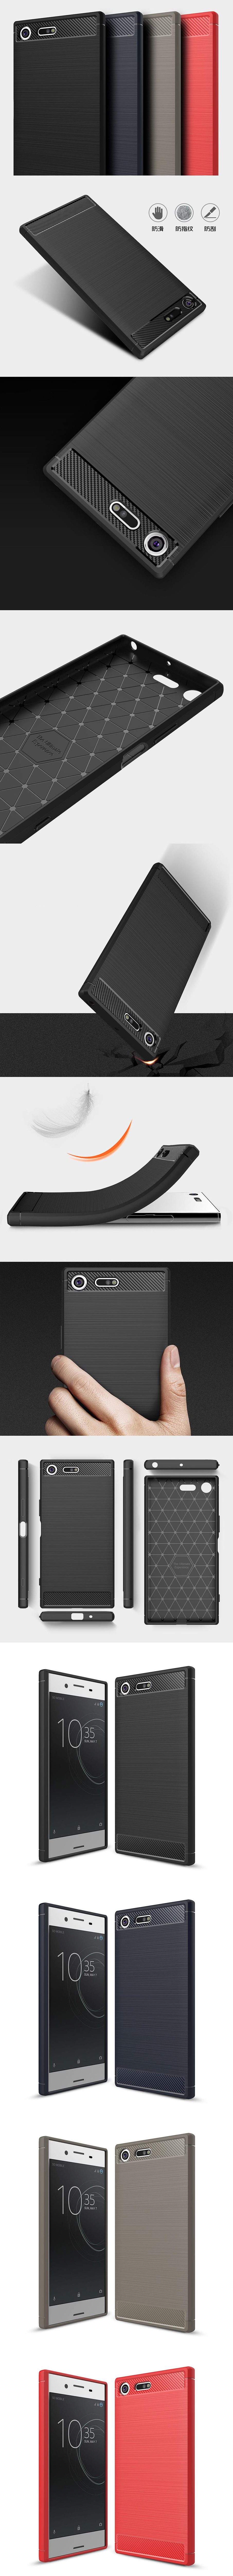 210-Sony-TPU按鍵全包式手機殼背蓋